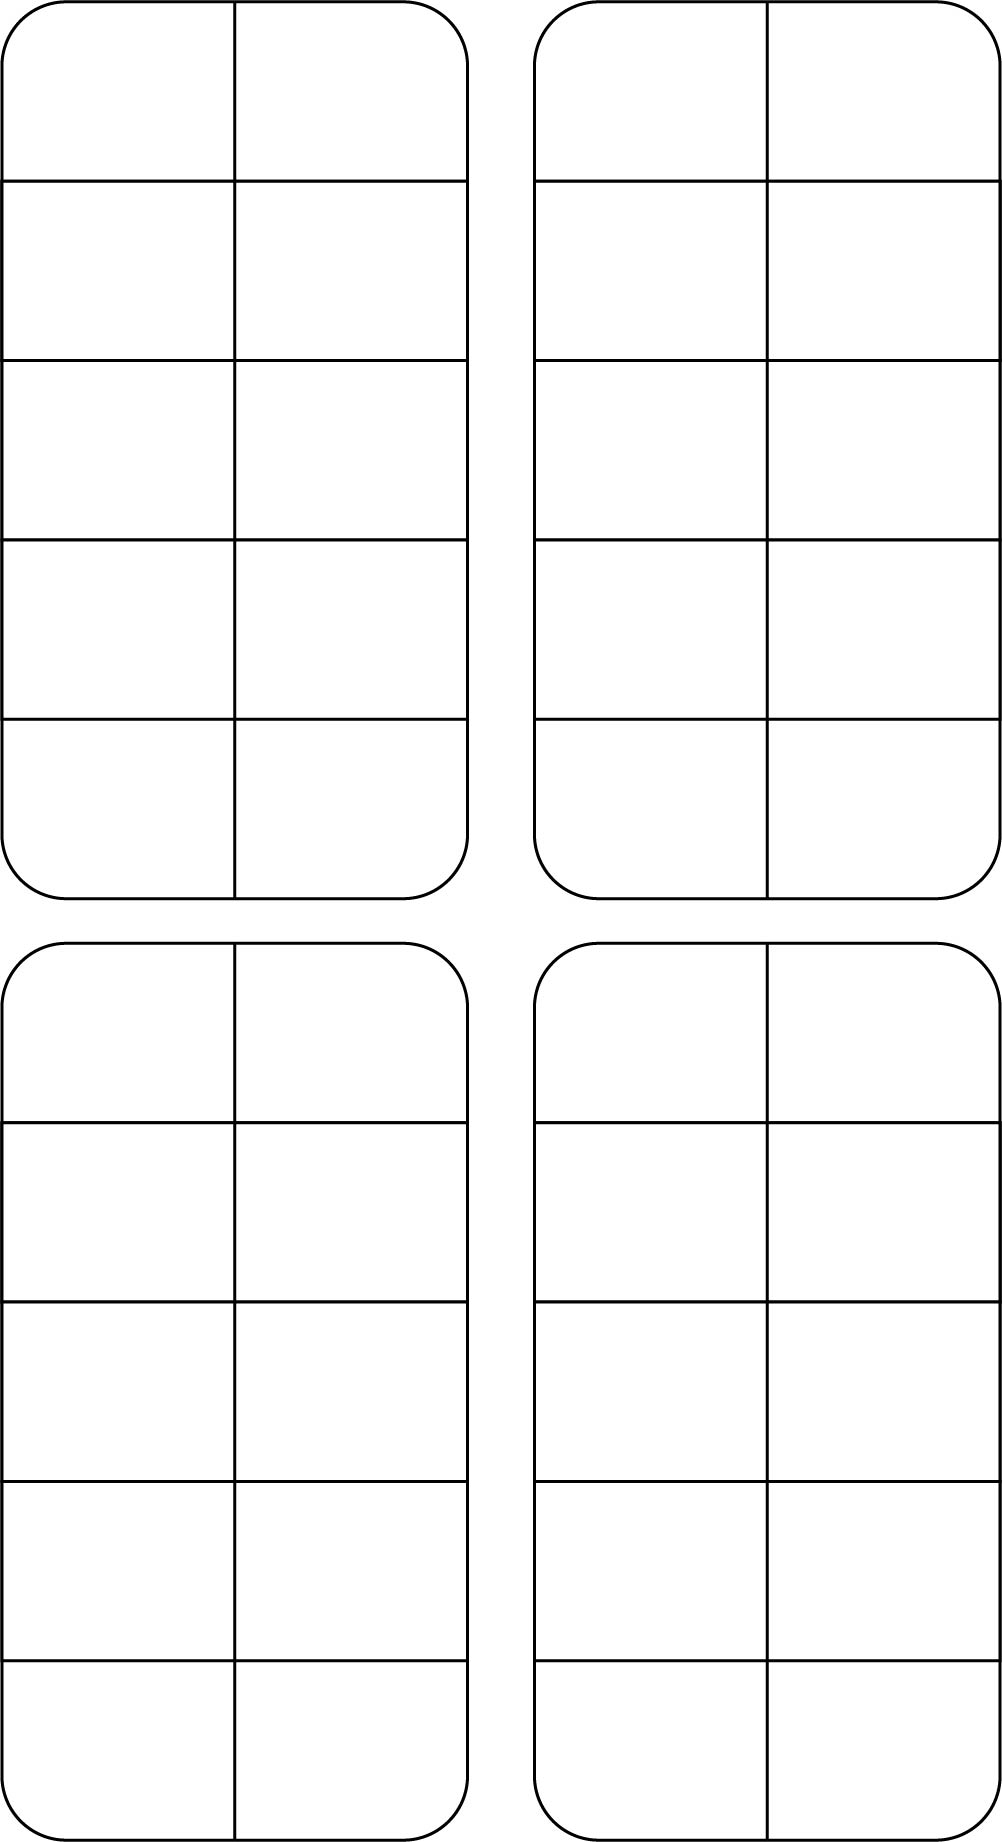 Exelent Double Ten Frame Sketch - Framed Art Ideas - roadofriches.com